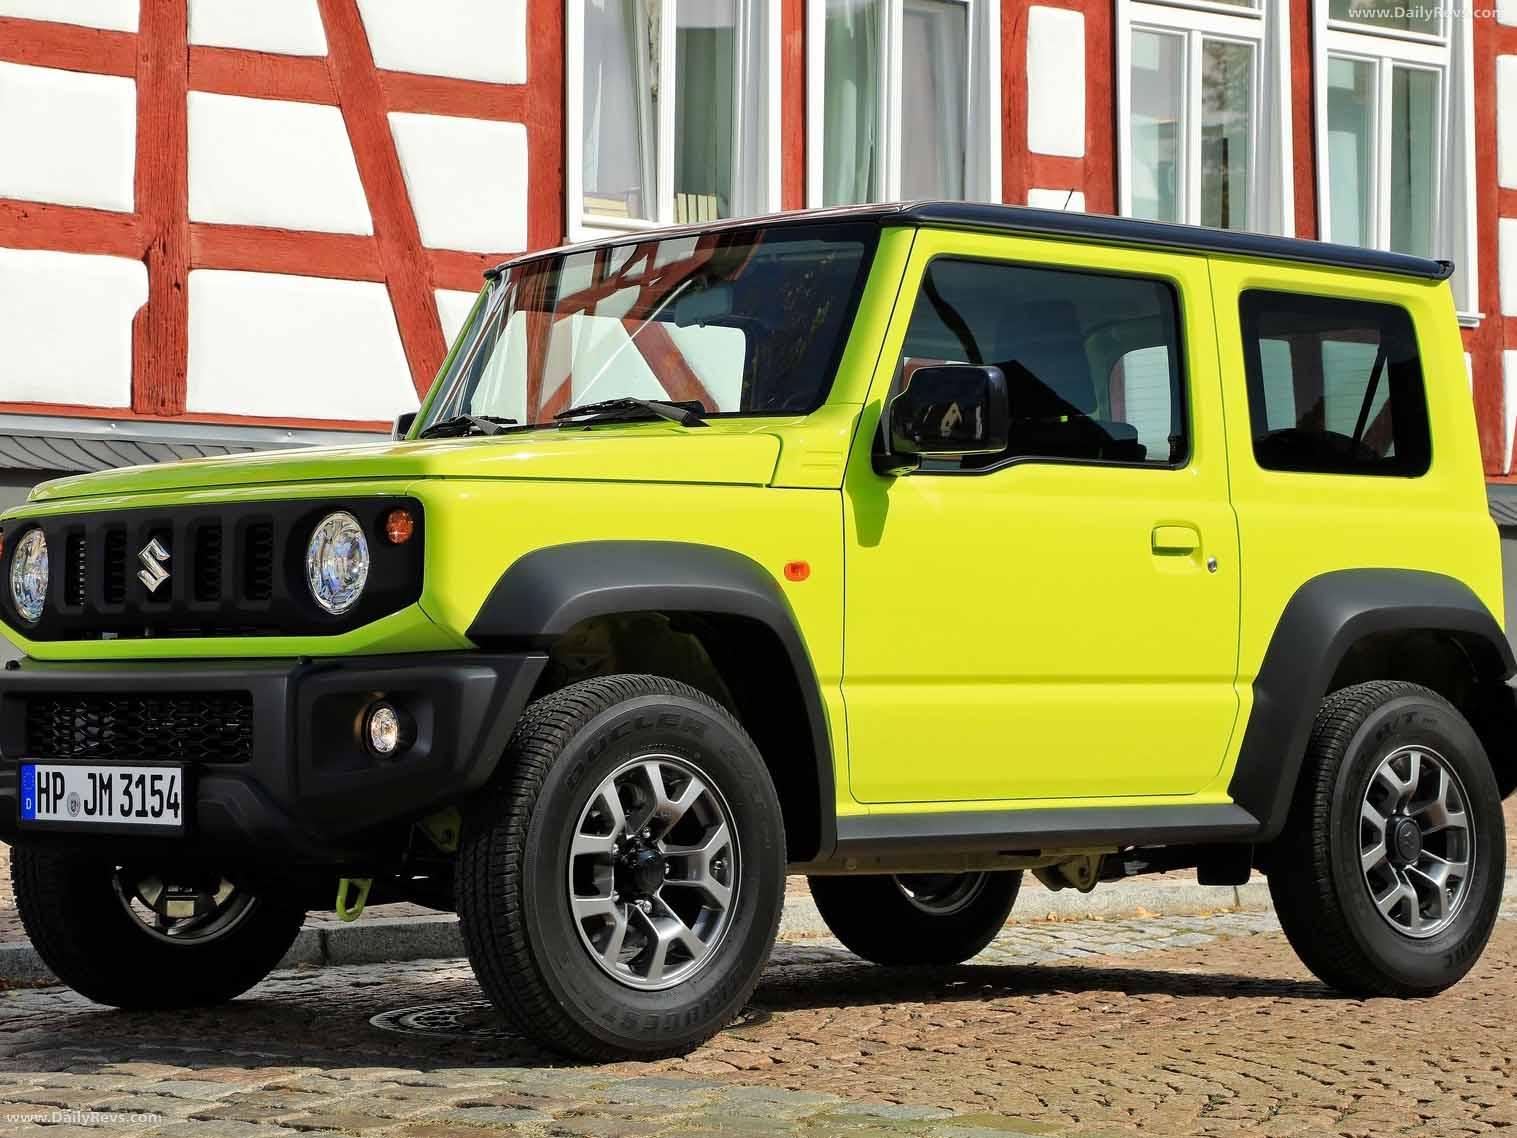 2019 Suzuki Jimny - HD Pictures, Videos, Specs ...